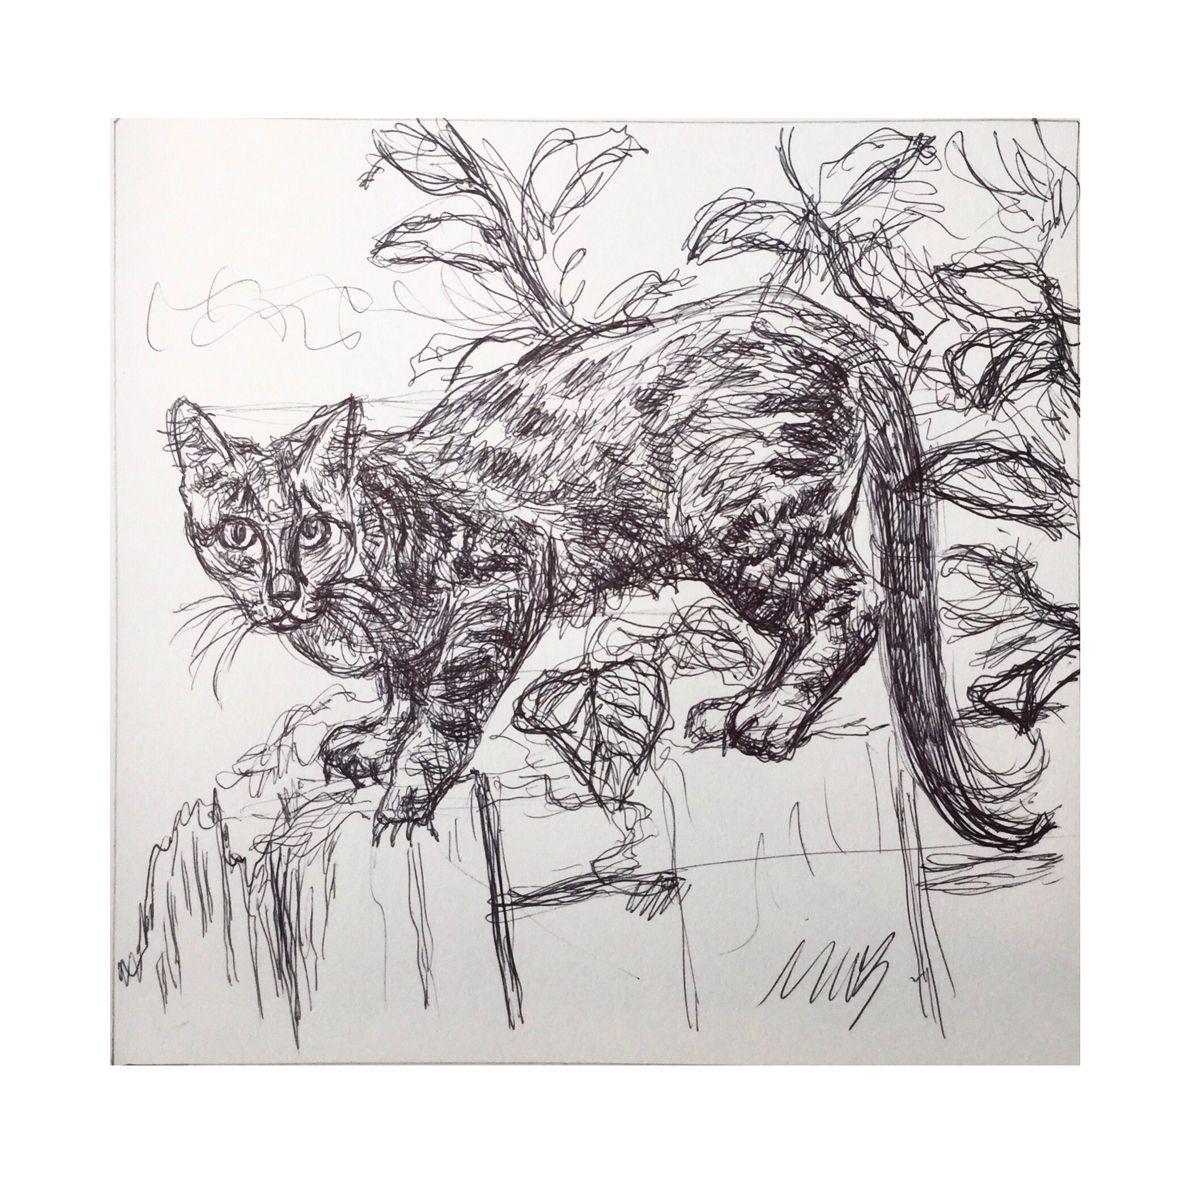 Decided to do an inktober of cats. Day 1 #inktobercats #inktobercat #inktober2020 #inktober #inkdrawing #inkdrawings #inkonpaper #catsofinstagram #catdrawing #inktobercatho2019 #mycreativity #myartwork🎨 #🎨 #🎨🎨🎨 #artlovers #instadrawing #instaink #ink_art_gallery #artistsoninsta #artistsofinstagra